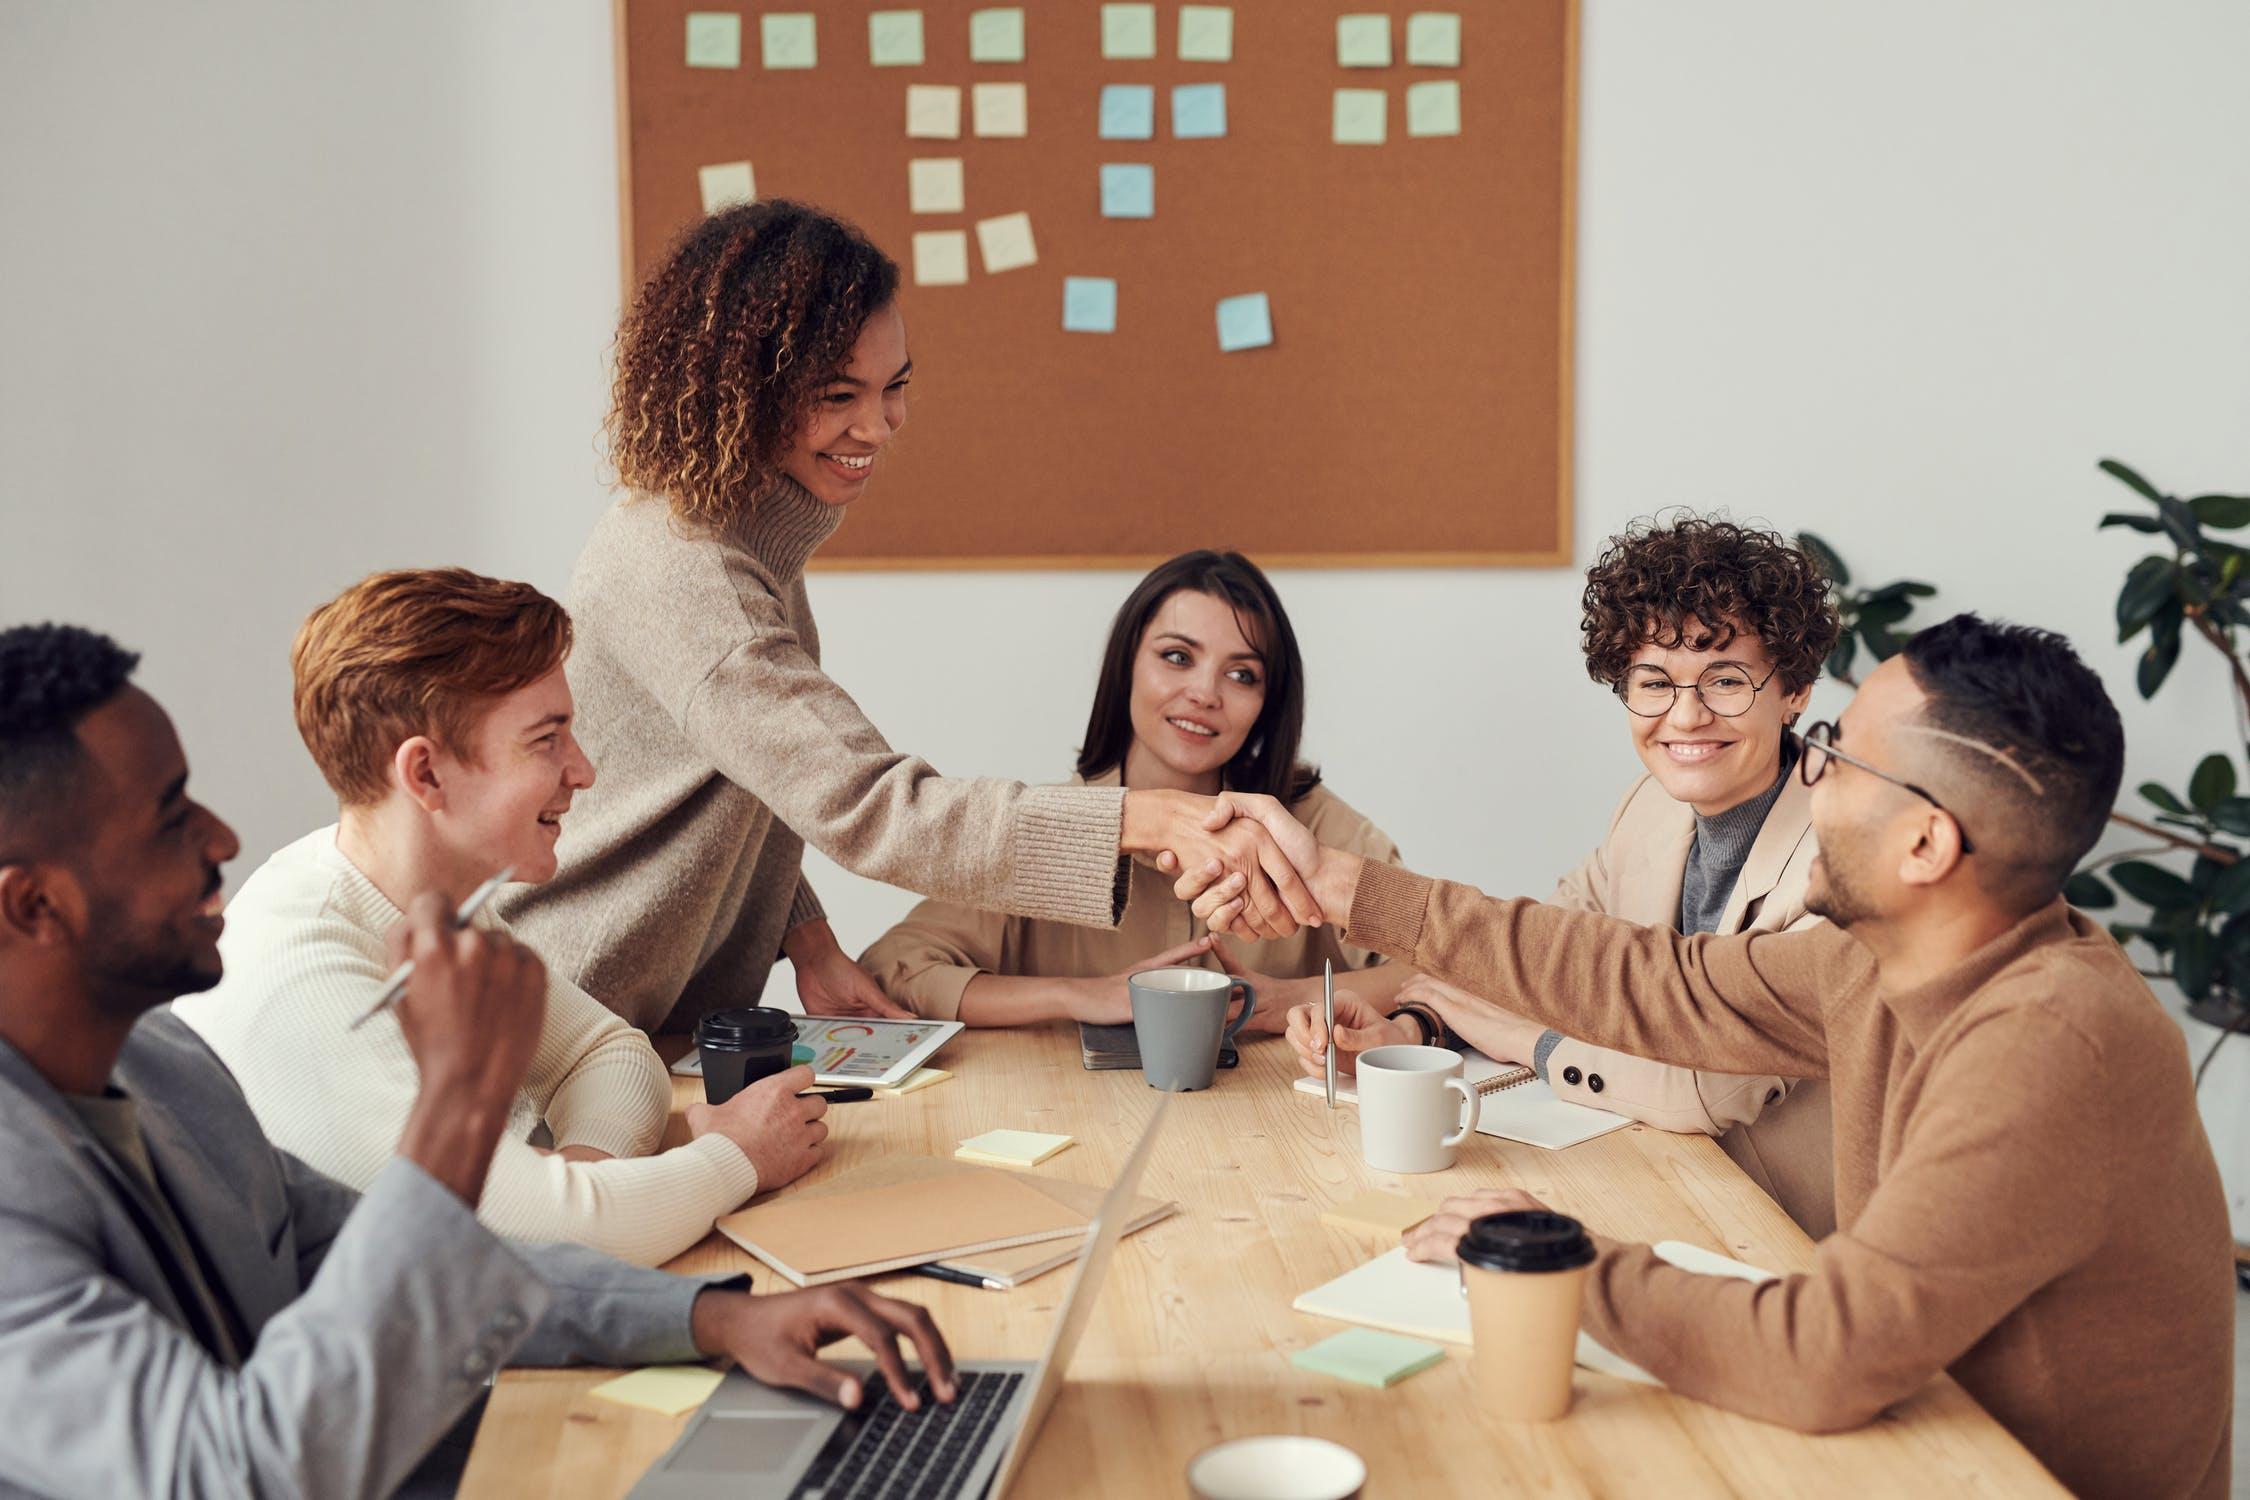 Retail Level 4: Workplace Communication